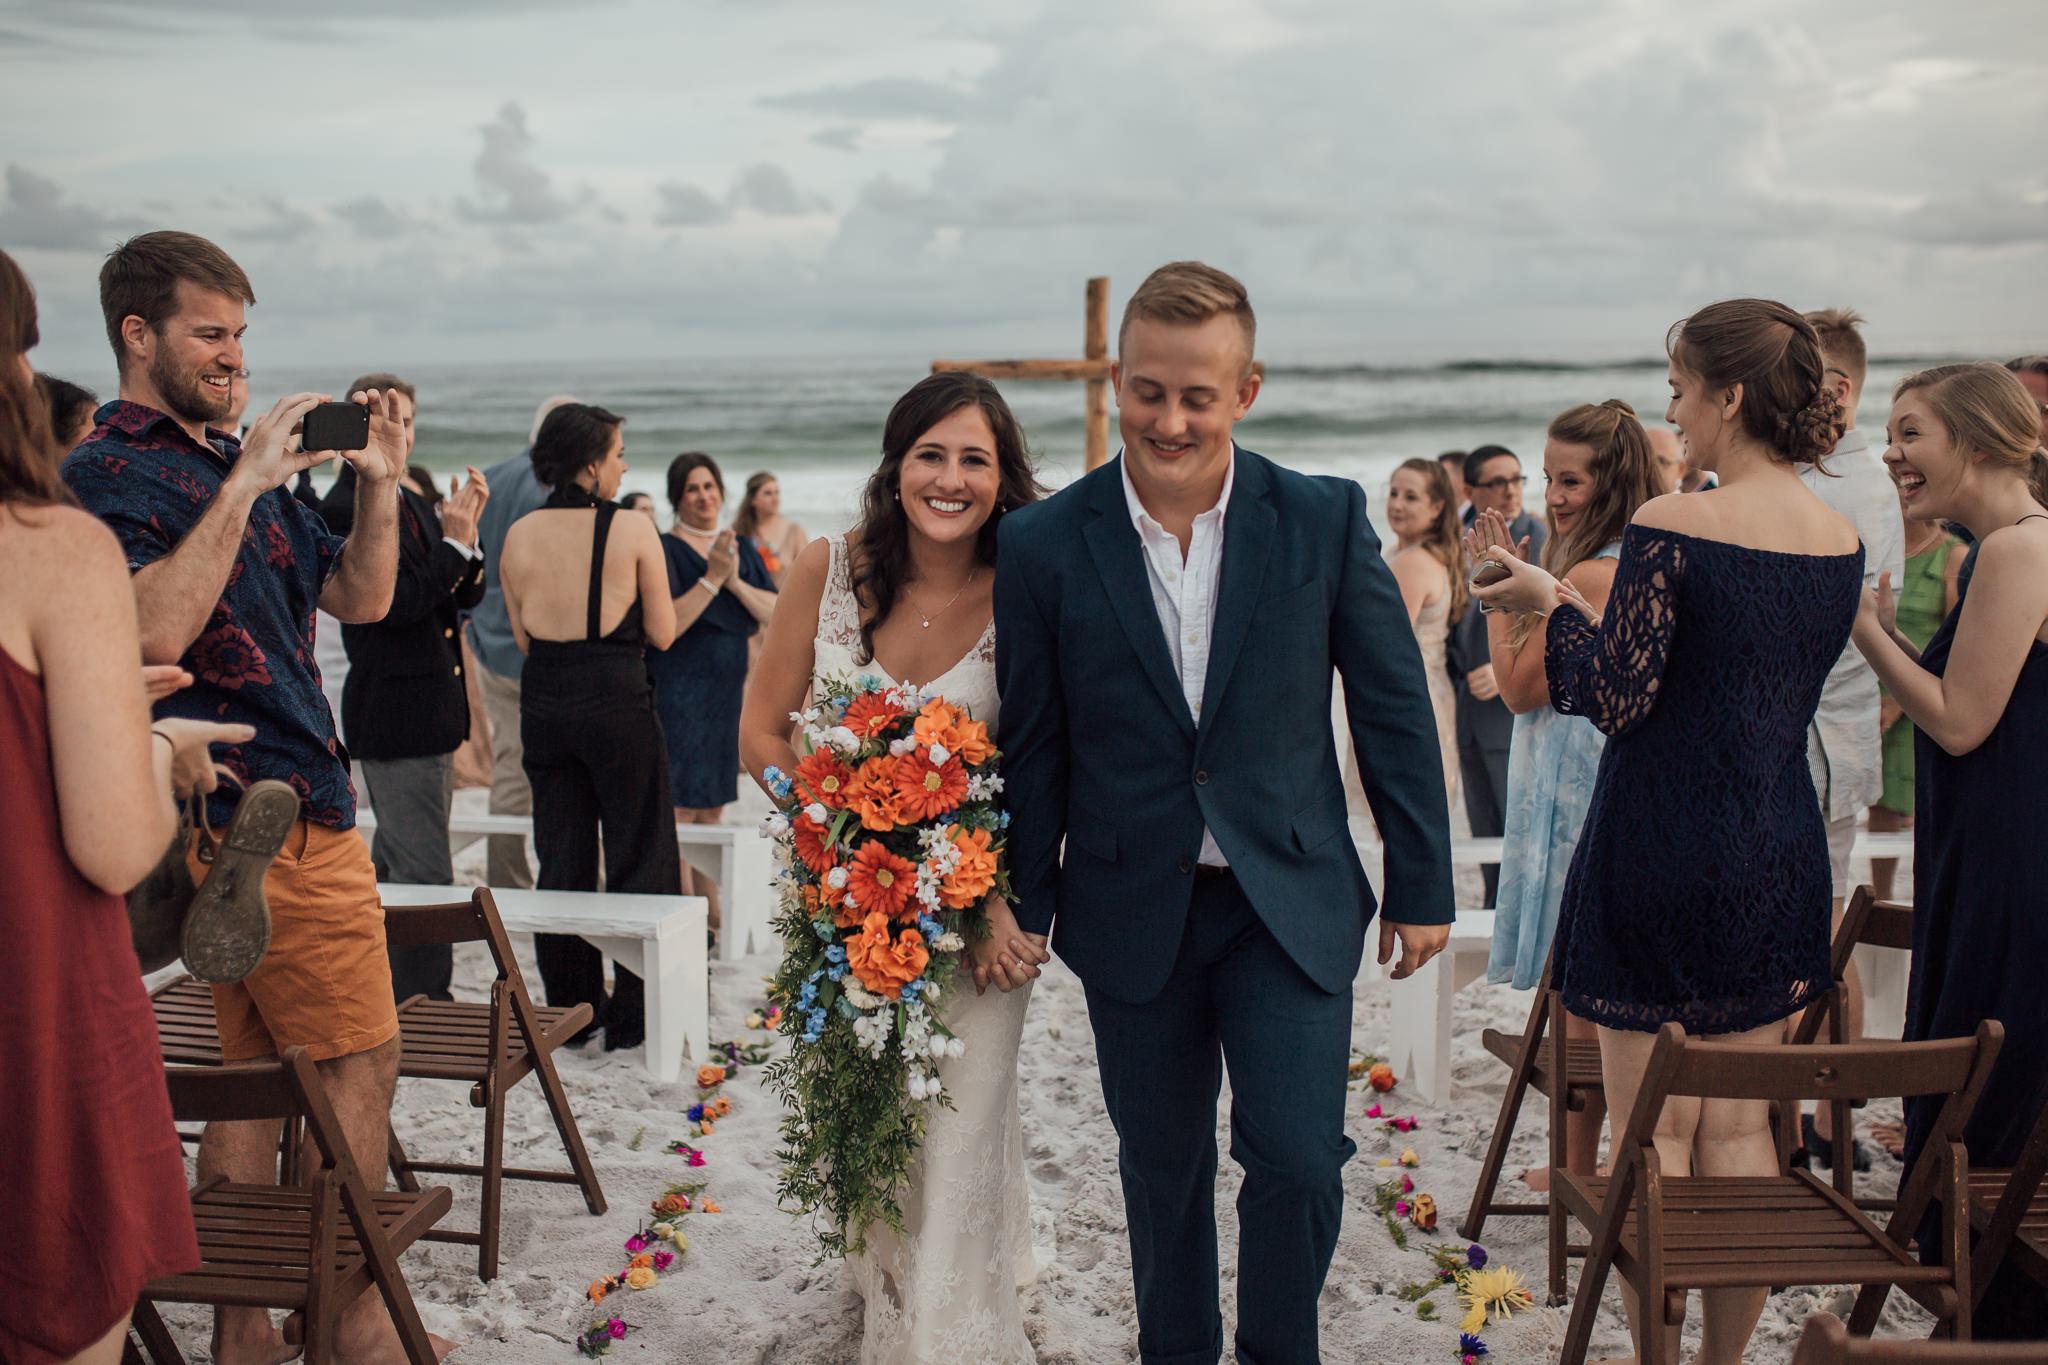 cassie-cook-photography-santa-rosa-beach-wedding-farrar-wedding-73.jpg